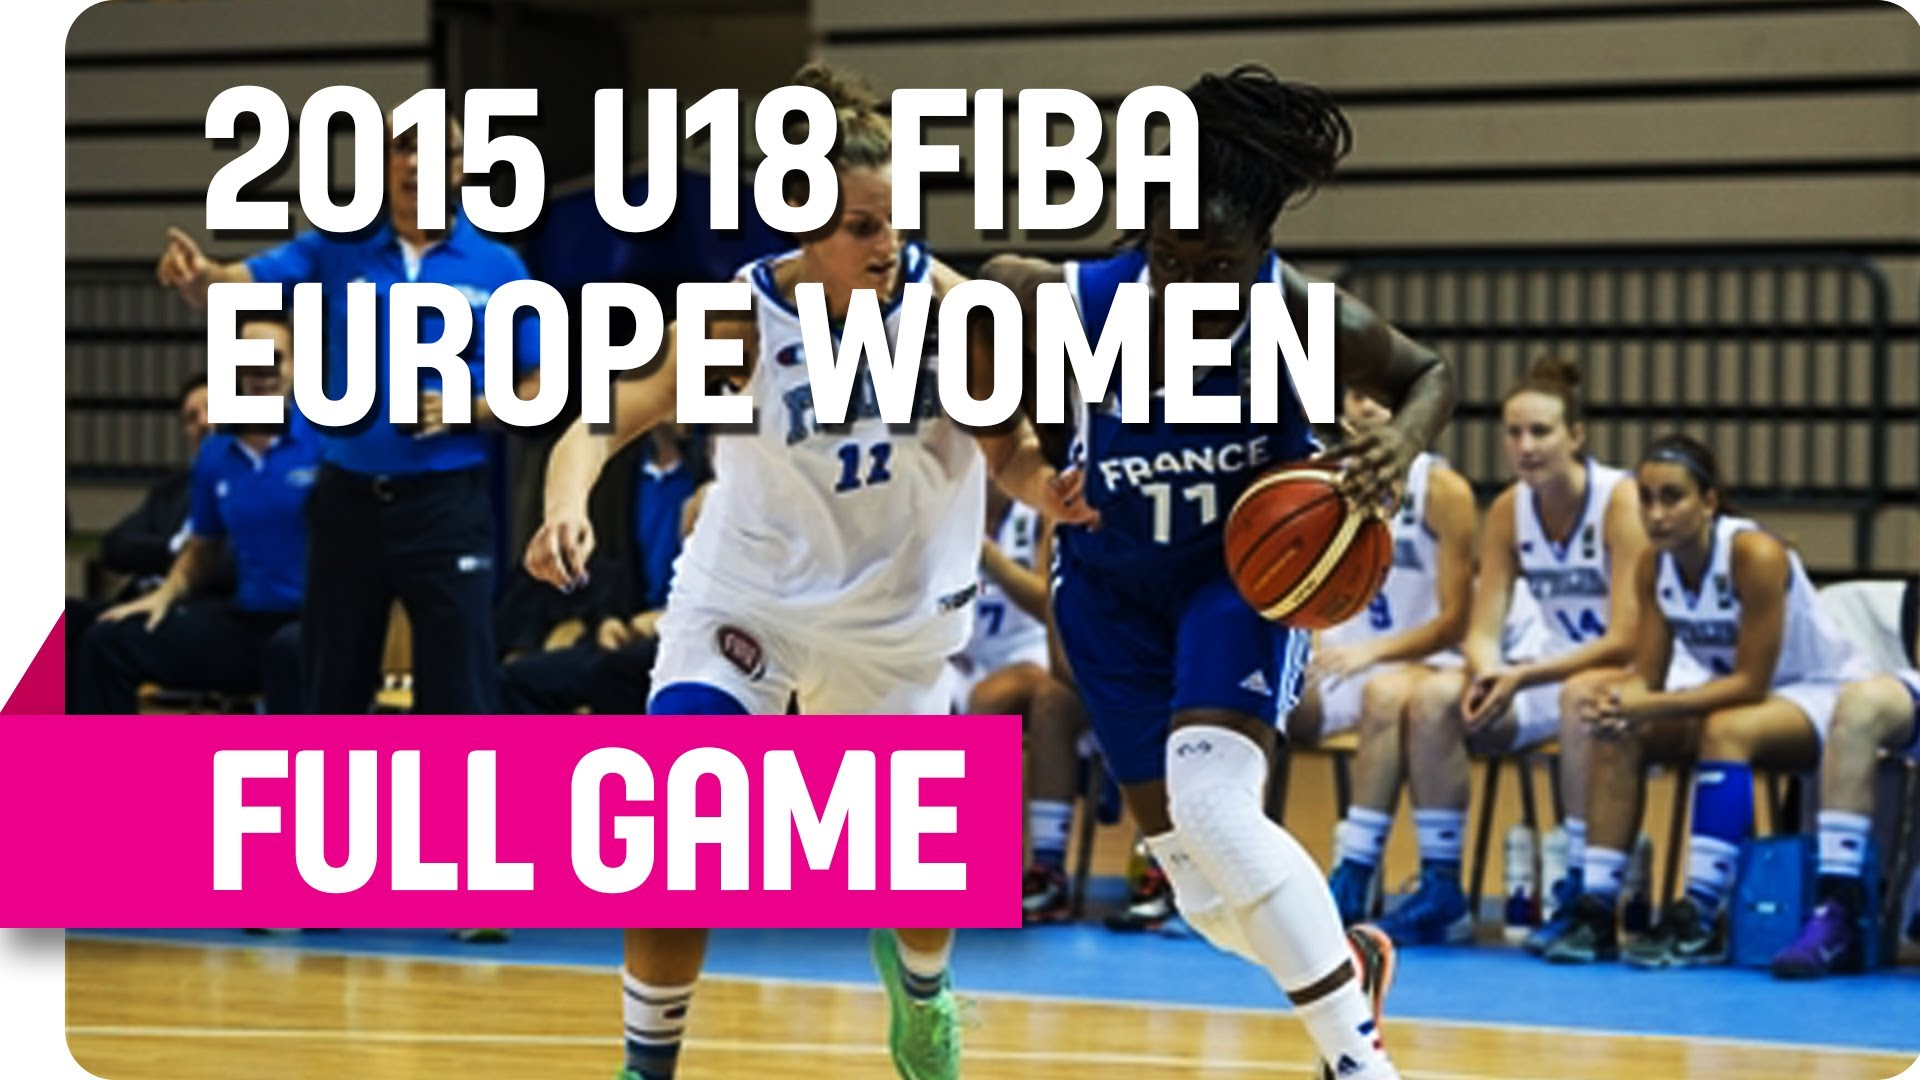 Italy v France - Group A - Live Stream - 2015 U18 European Championship Women